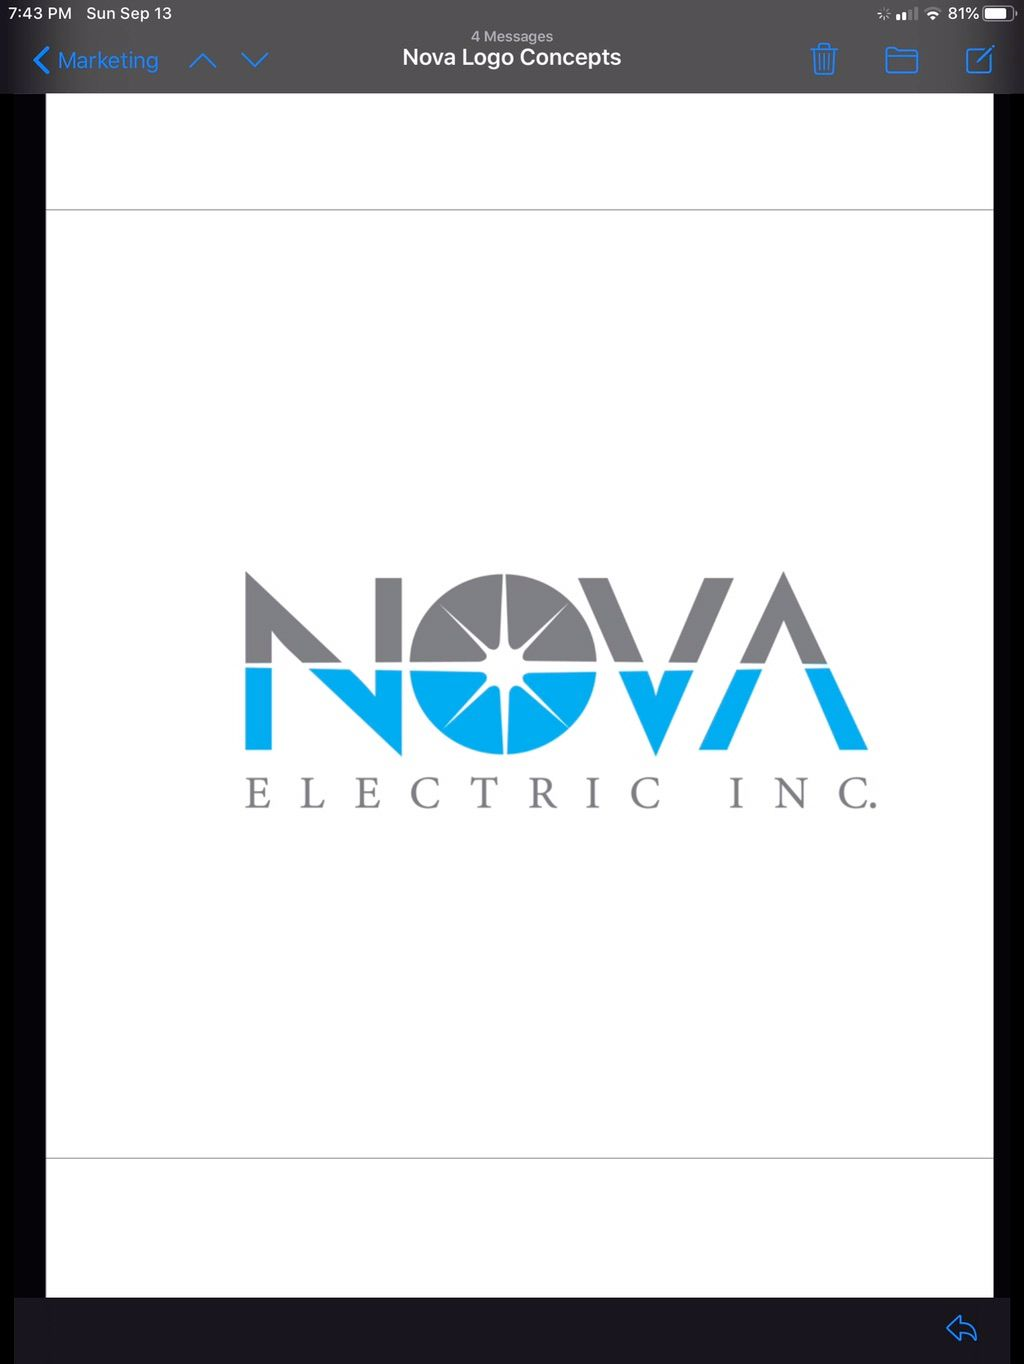 Nova Electric Inc